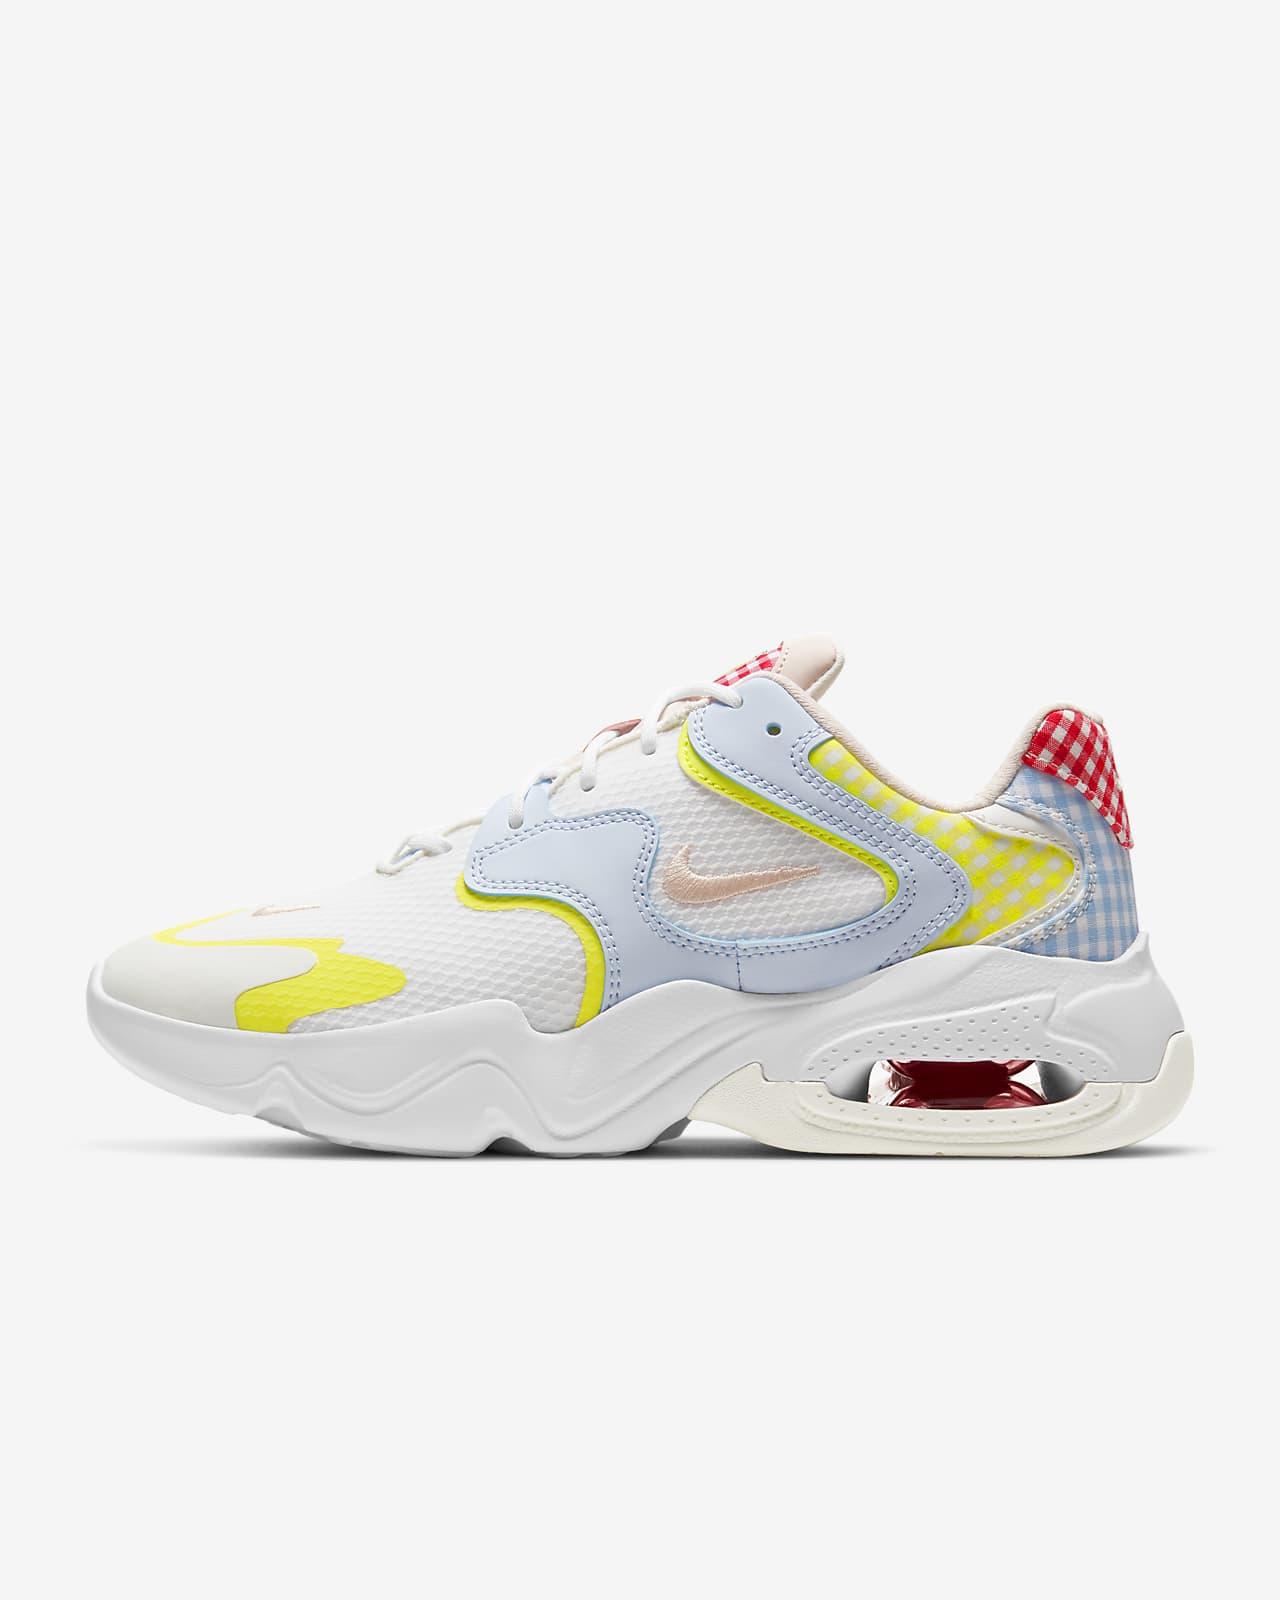 Nike Air Max 2X 女子运动鞋